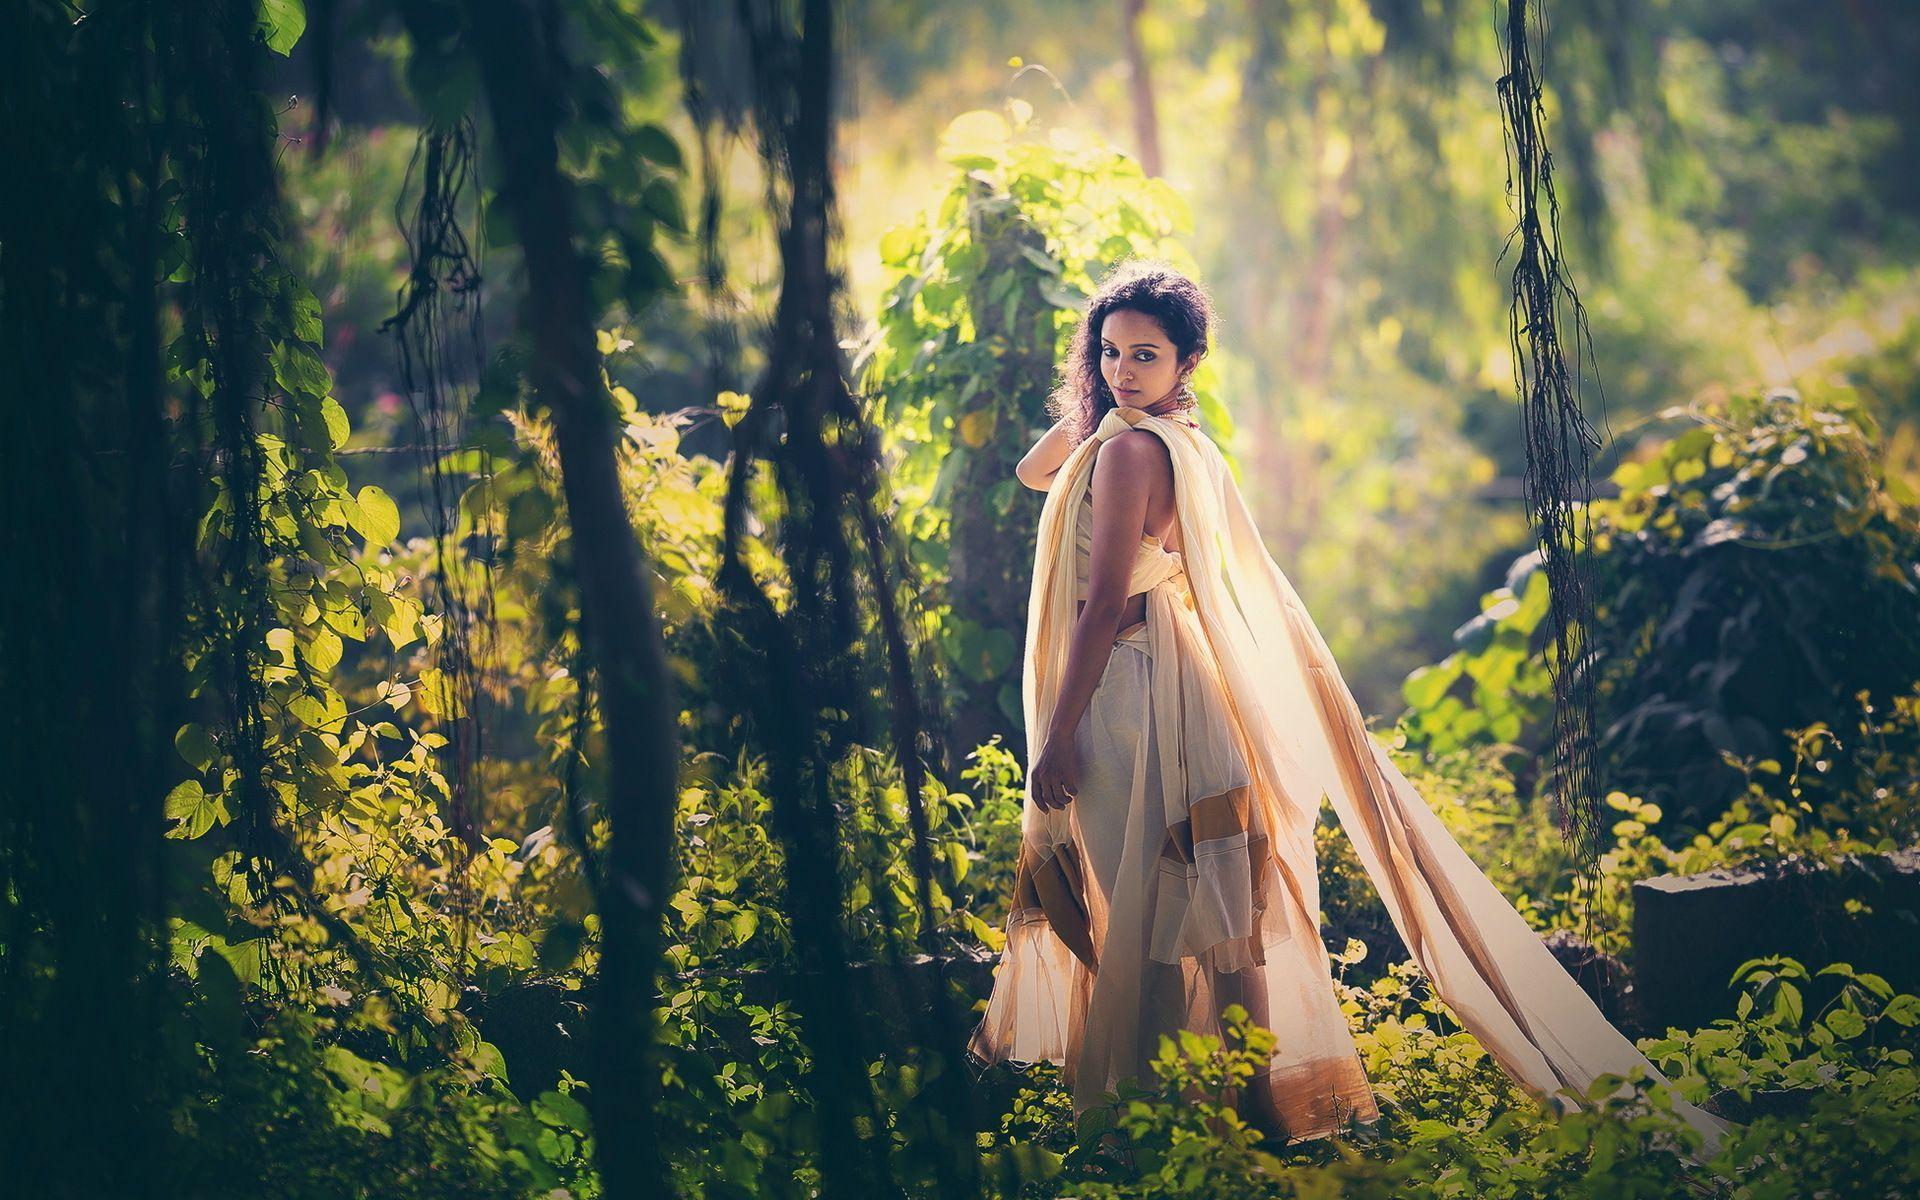 Indian Girl Wallpaper Full Hd Download Hd Indian Girl In The Forest Wallpaper Download Free